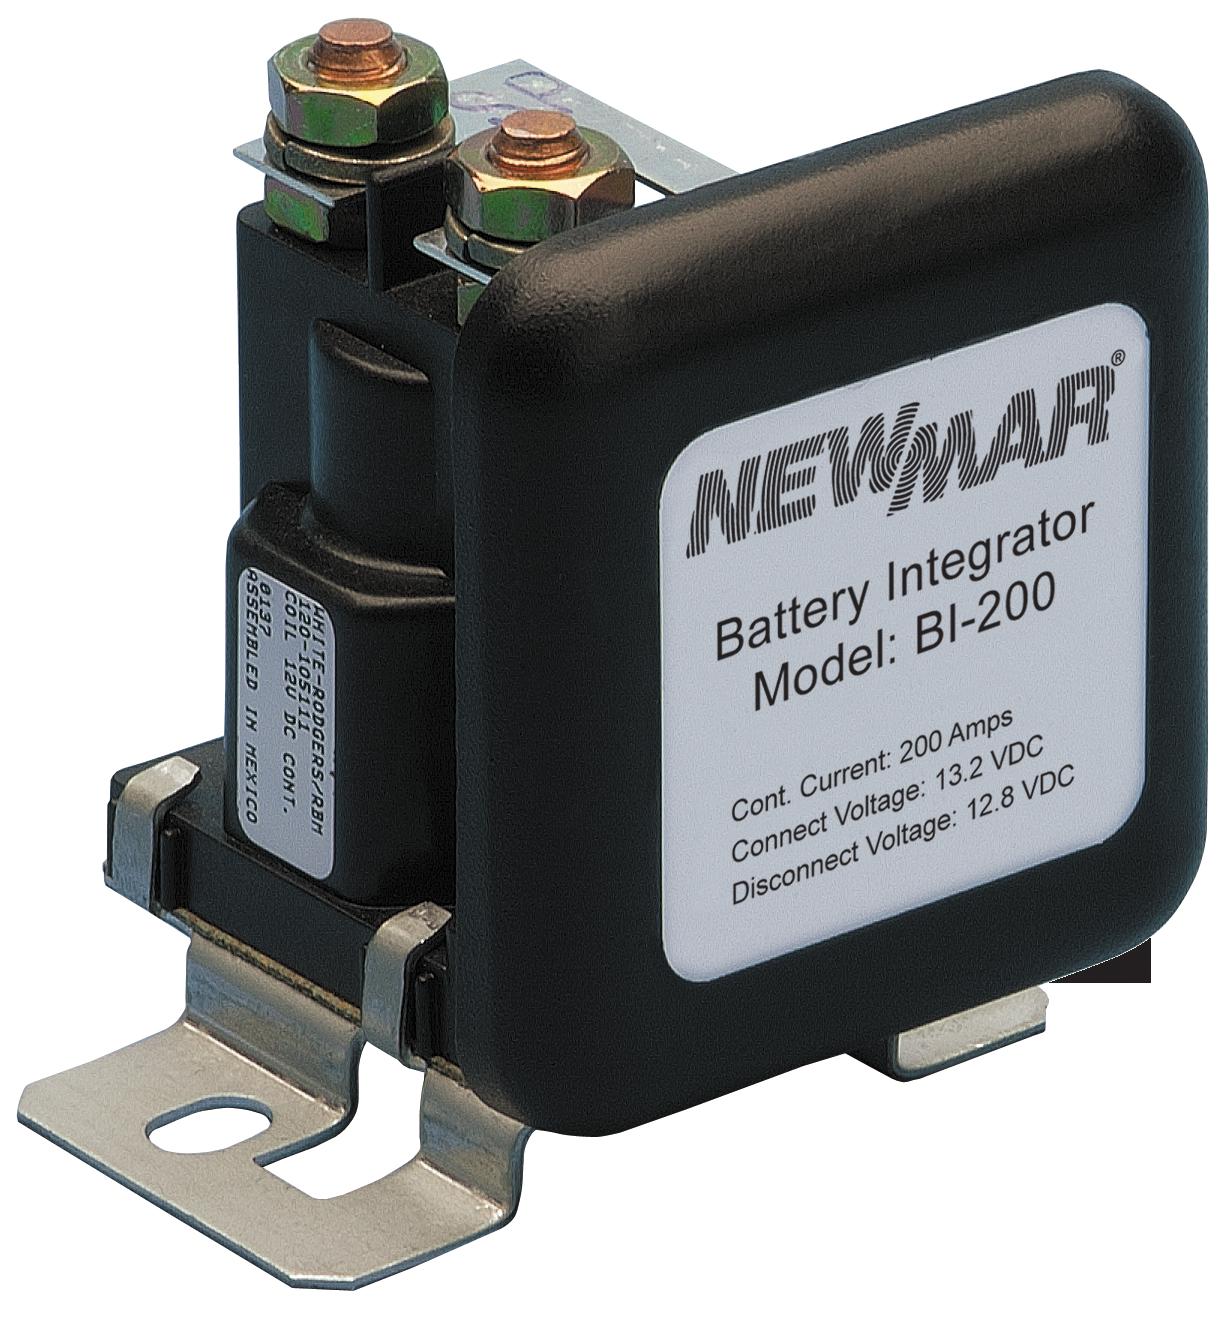 Battery Integrators - DC Power Onboard